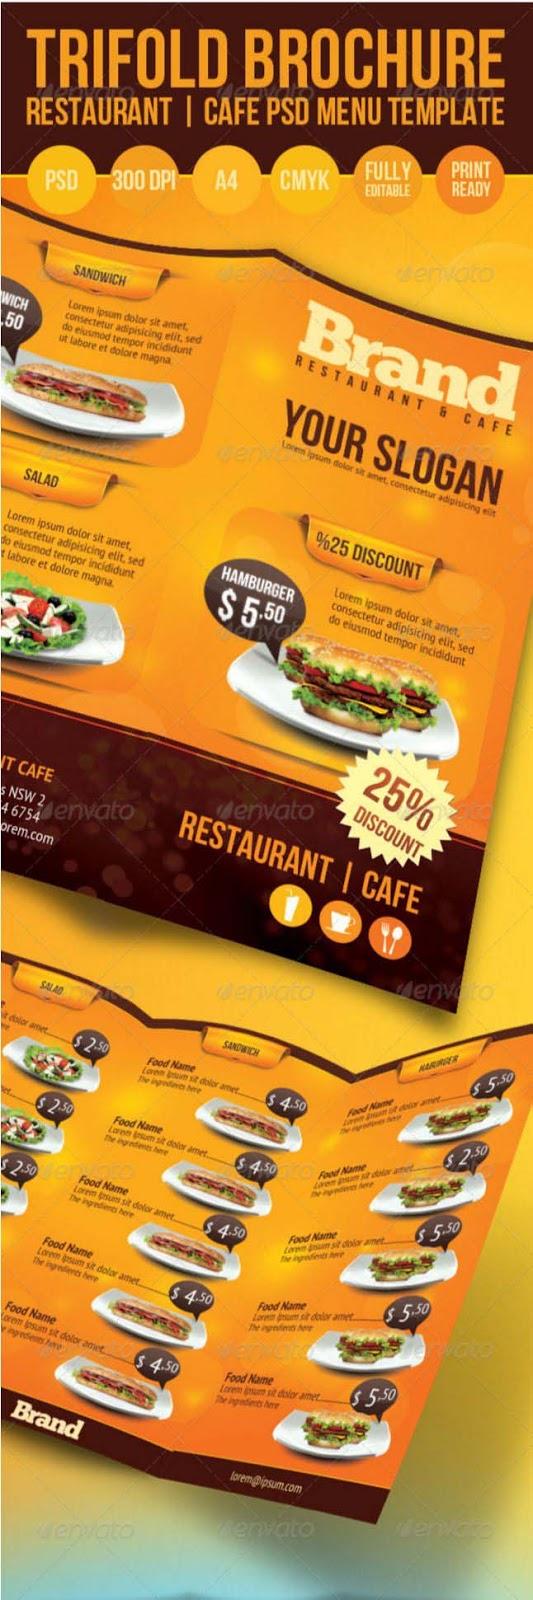 30 restaurant food menu templates indesign psd 2016 designsmag trifold brochure restaurant cafe menu psd template pronofoot35fo Choice Image